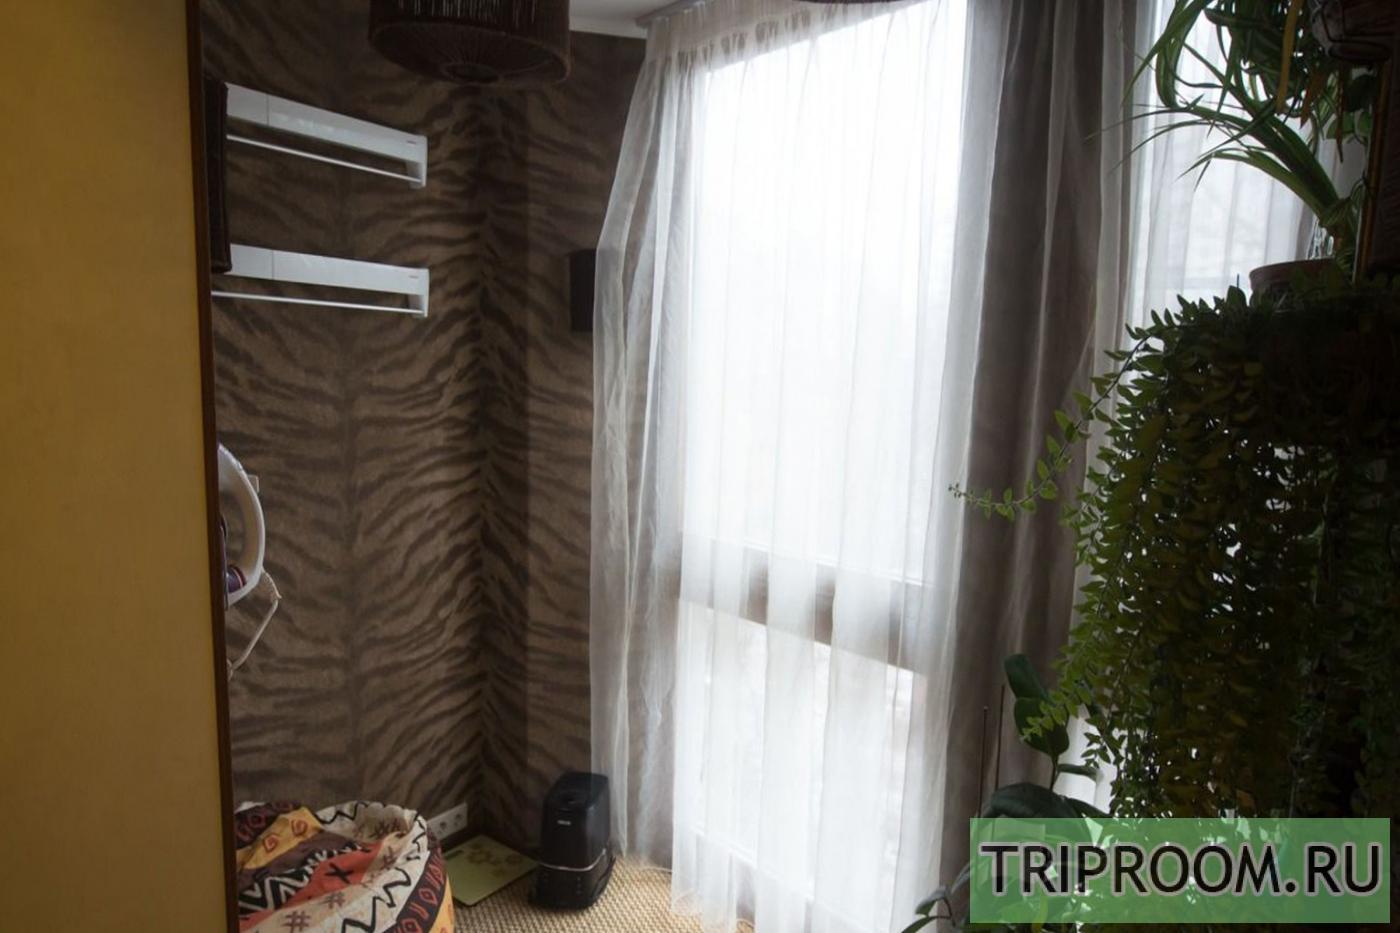 2-комнатная квартира посуточно (вариант № 24100), ул. Чехова улица, фото № 5